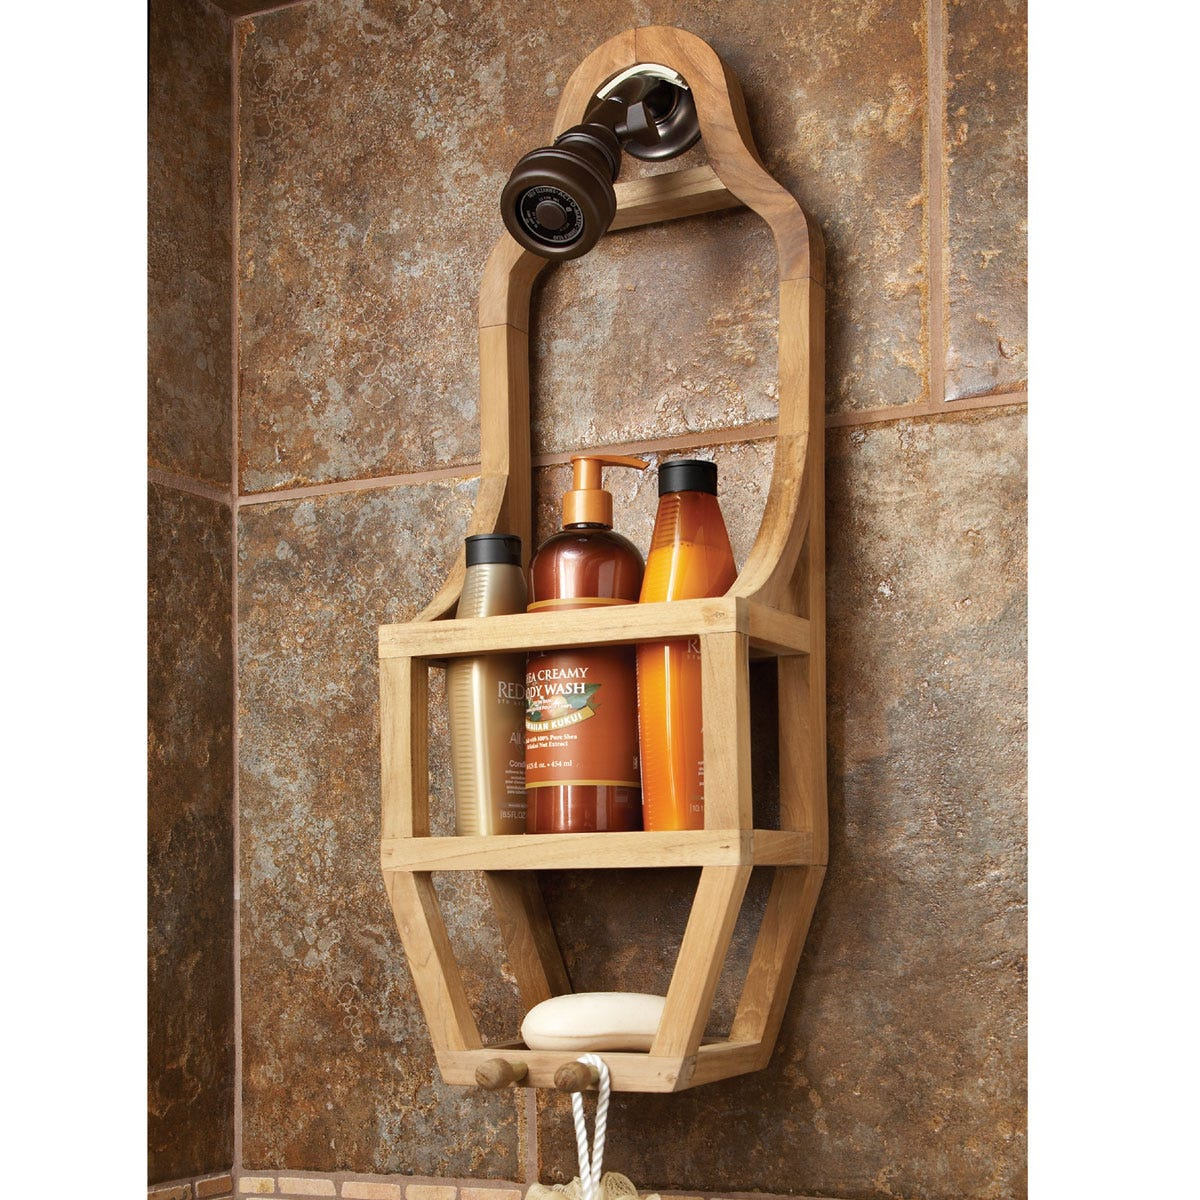 Teak Slim Shower Organizer - from Sportys Preferred Living